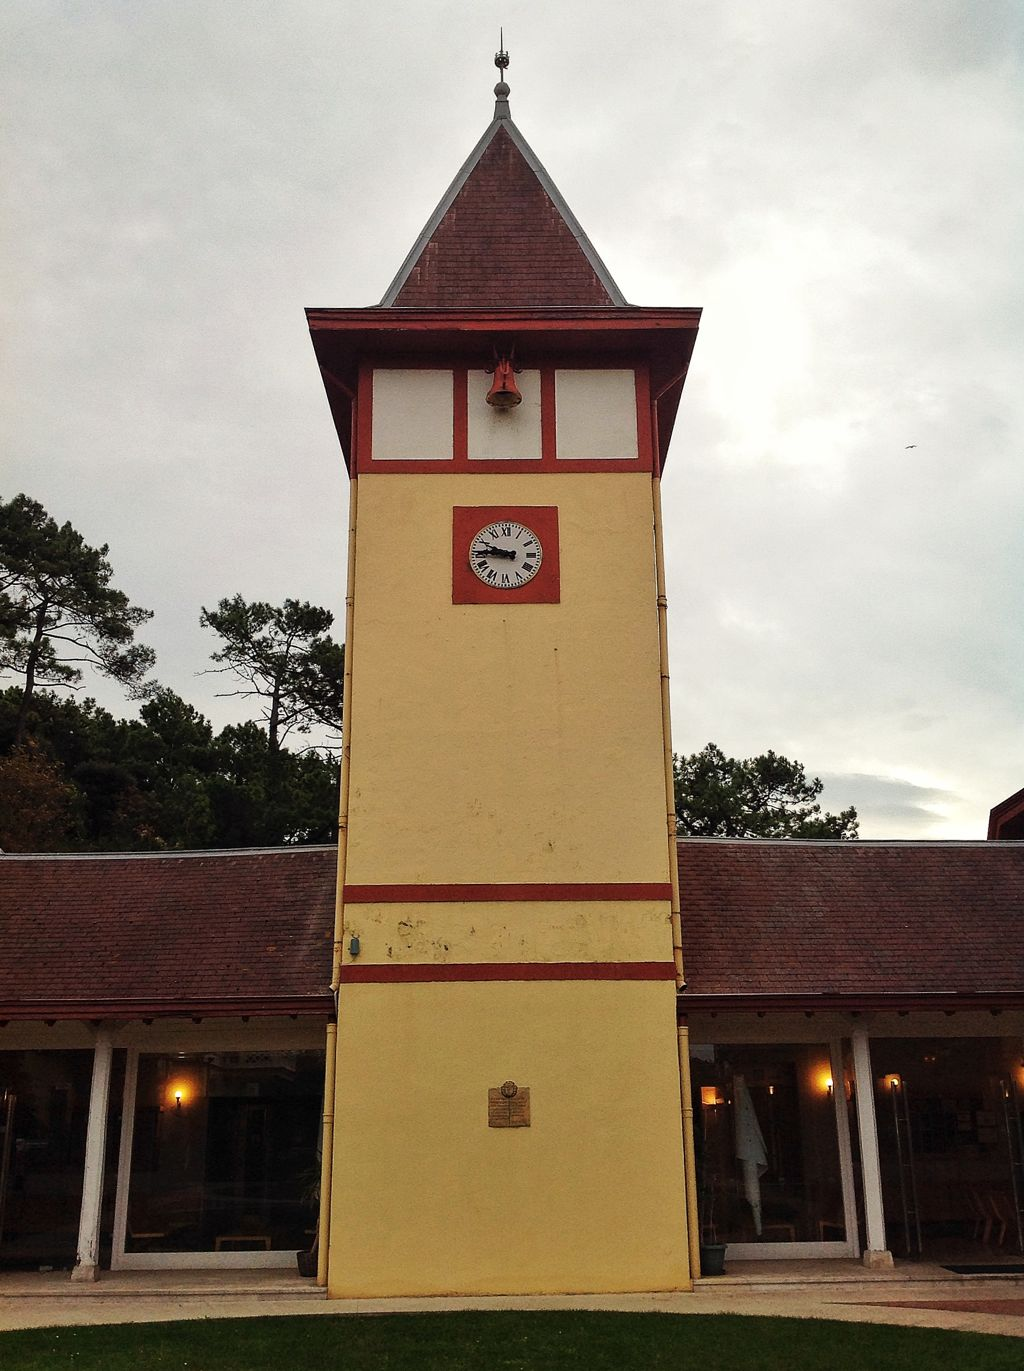 reloj-caballerizas-peninsula-magdalena-santander